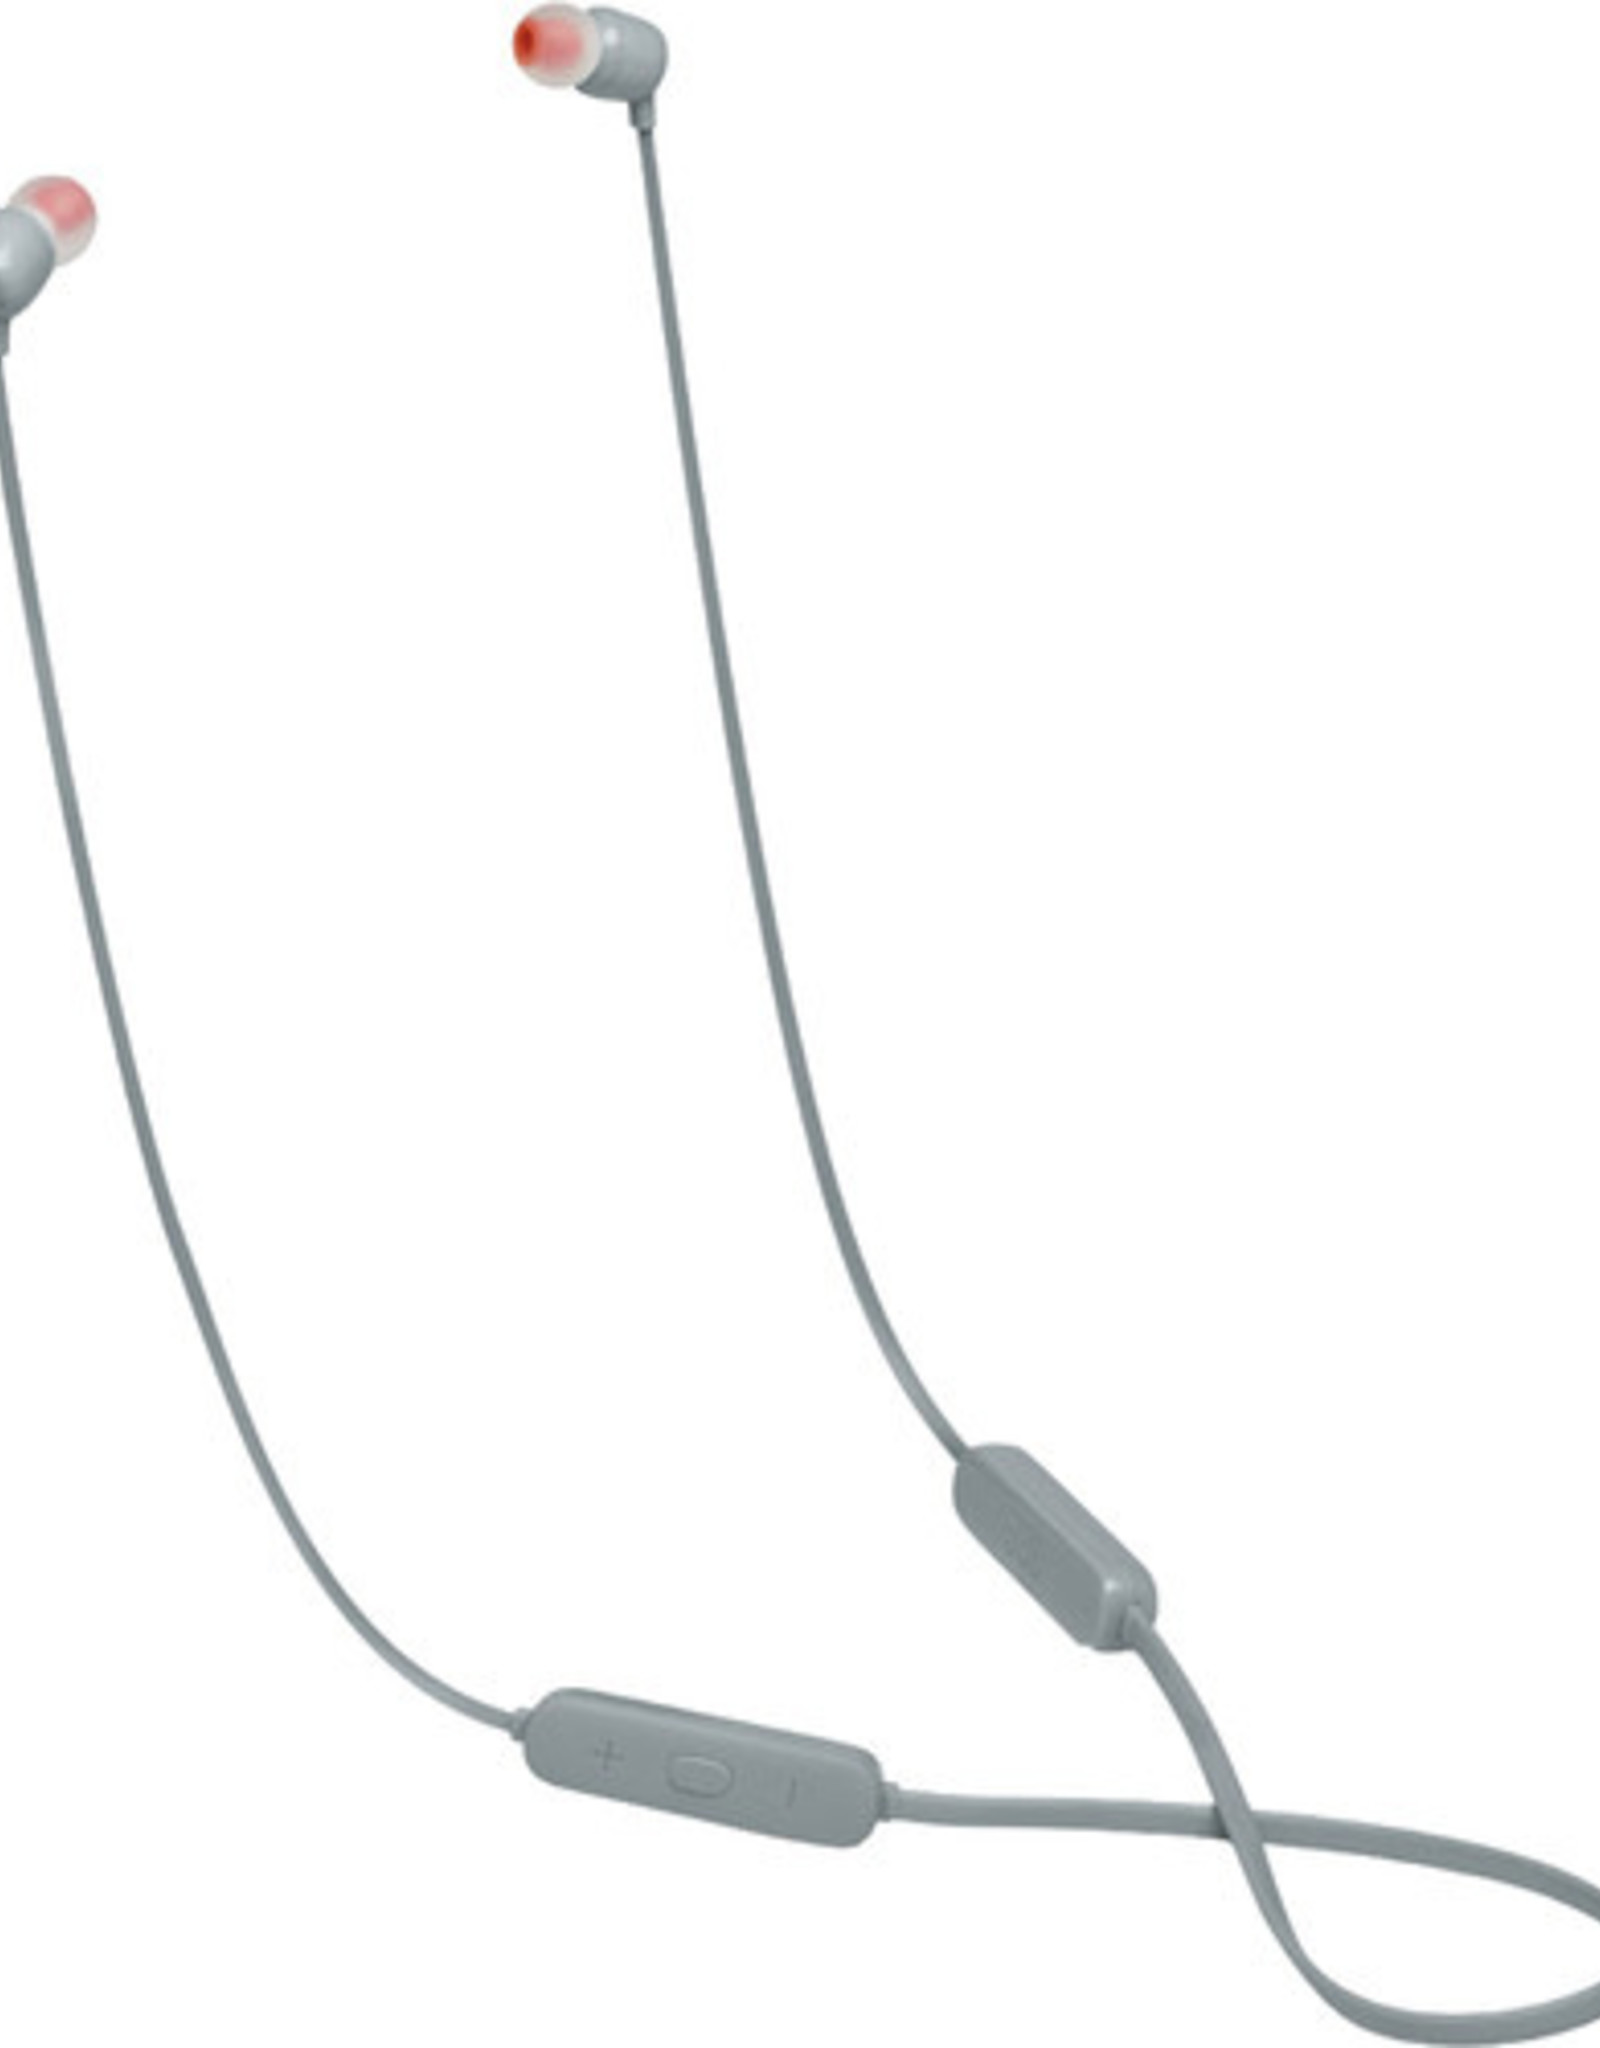 JBL JBL   inear BT headphones Grey JBLT115BTGRYAM